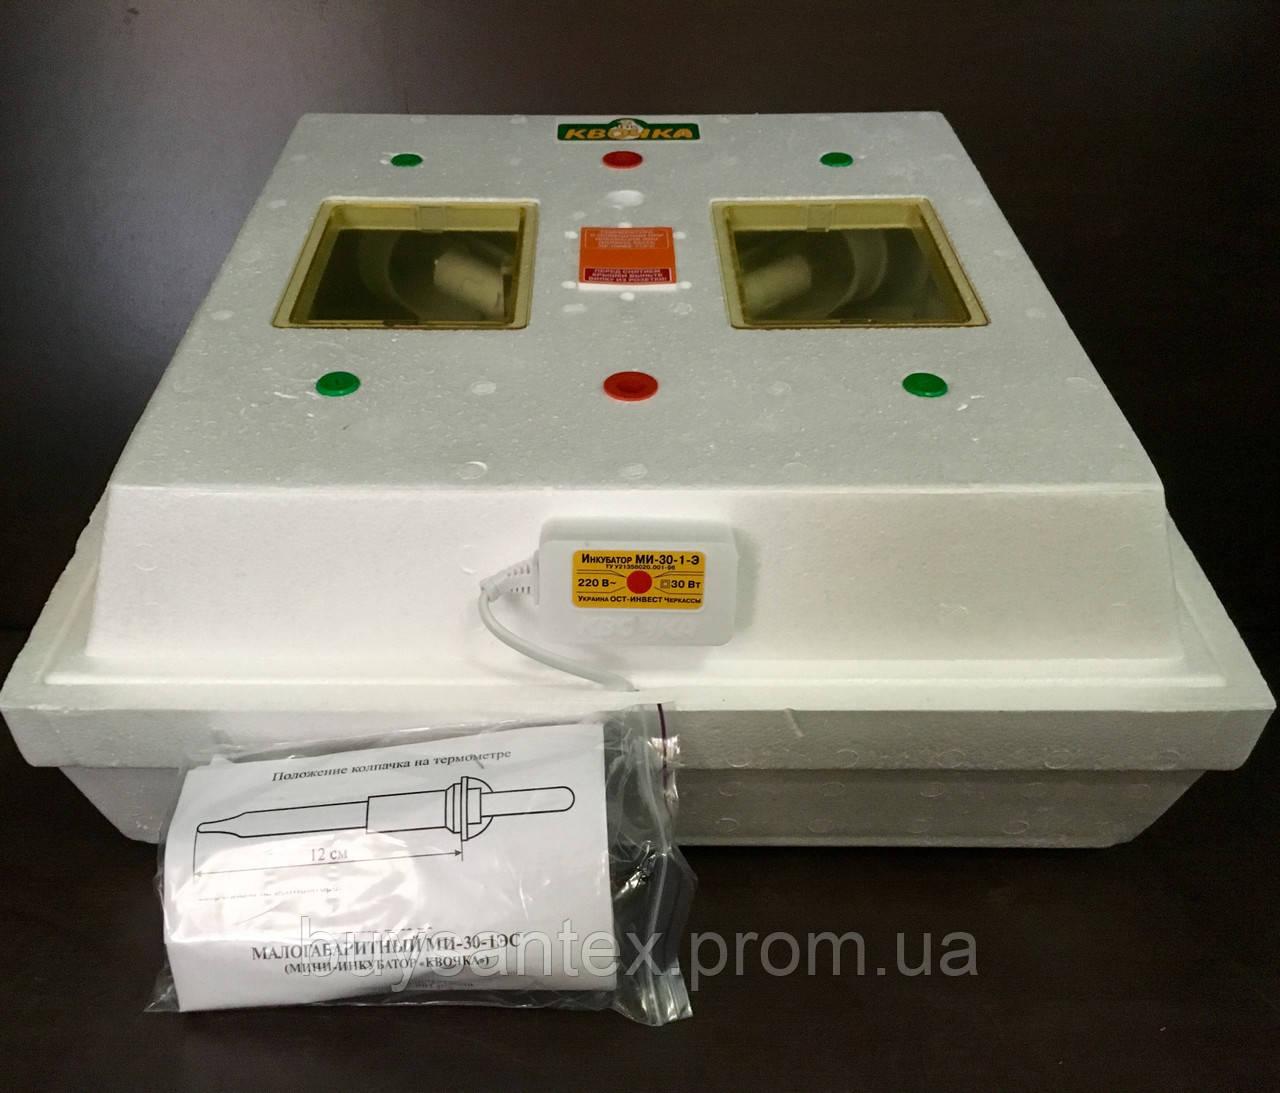 инструкция на терморегулятор апок 1